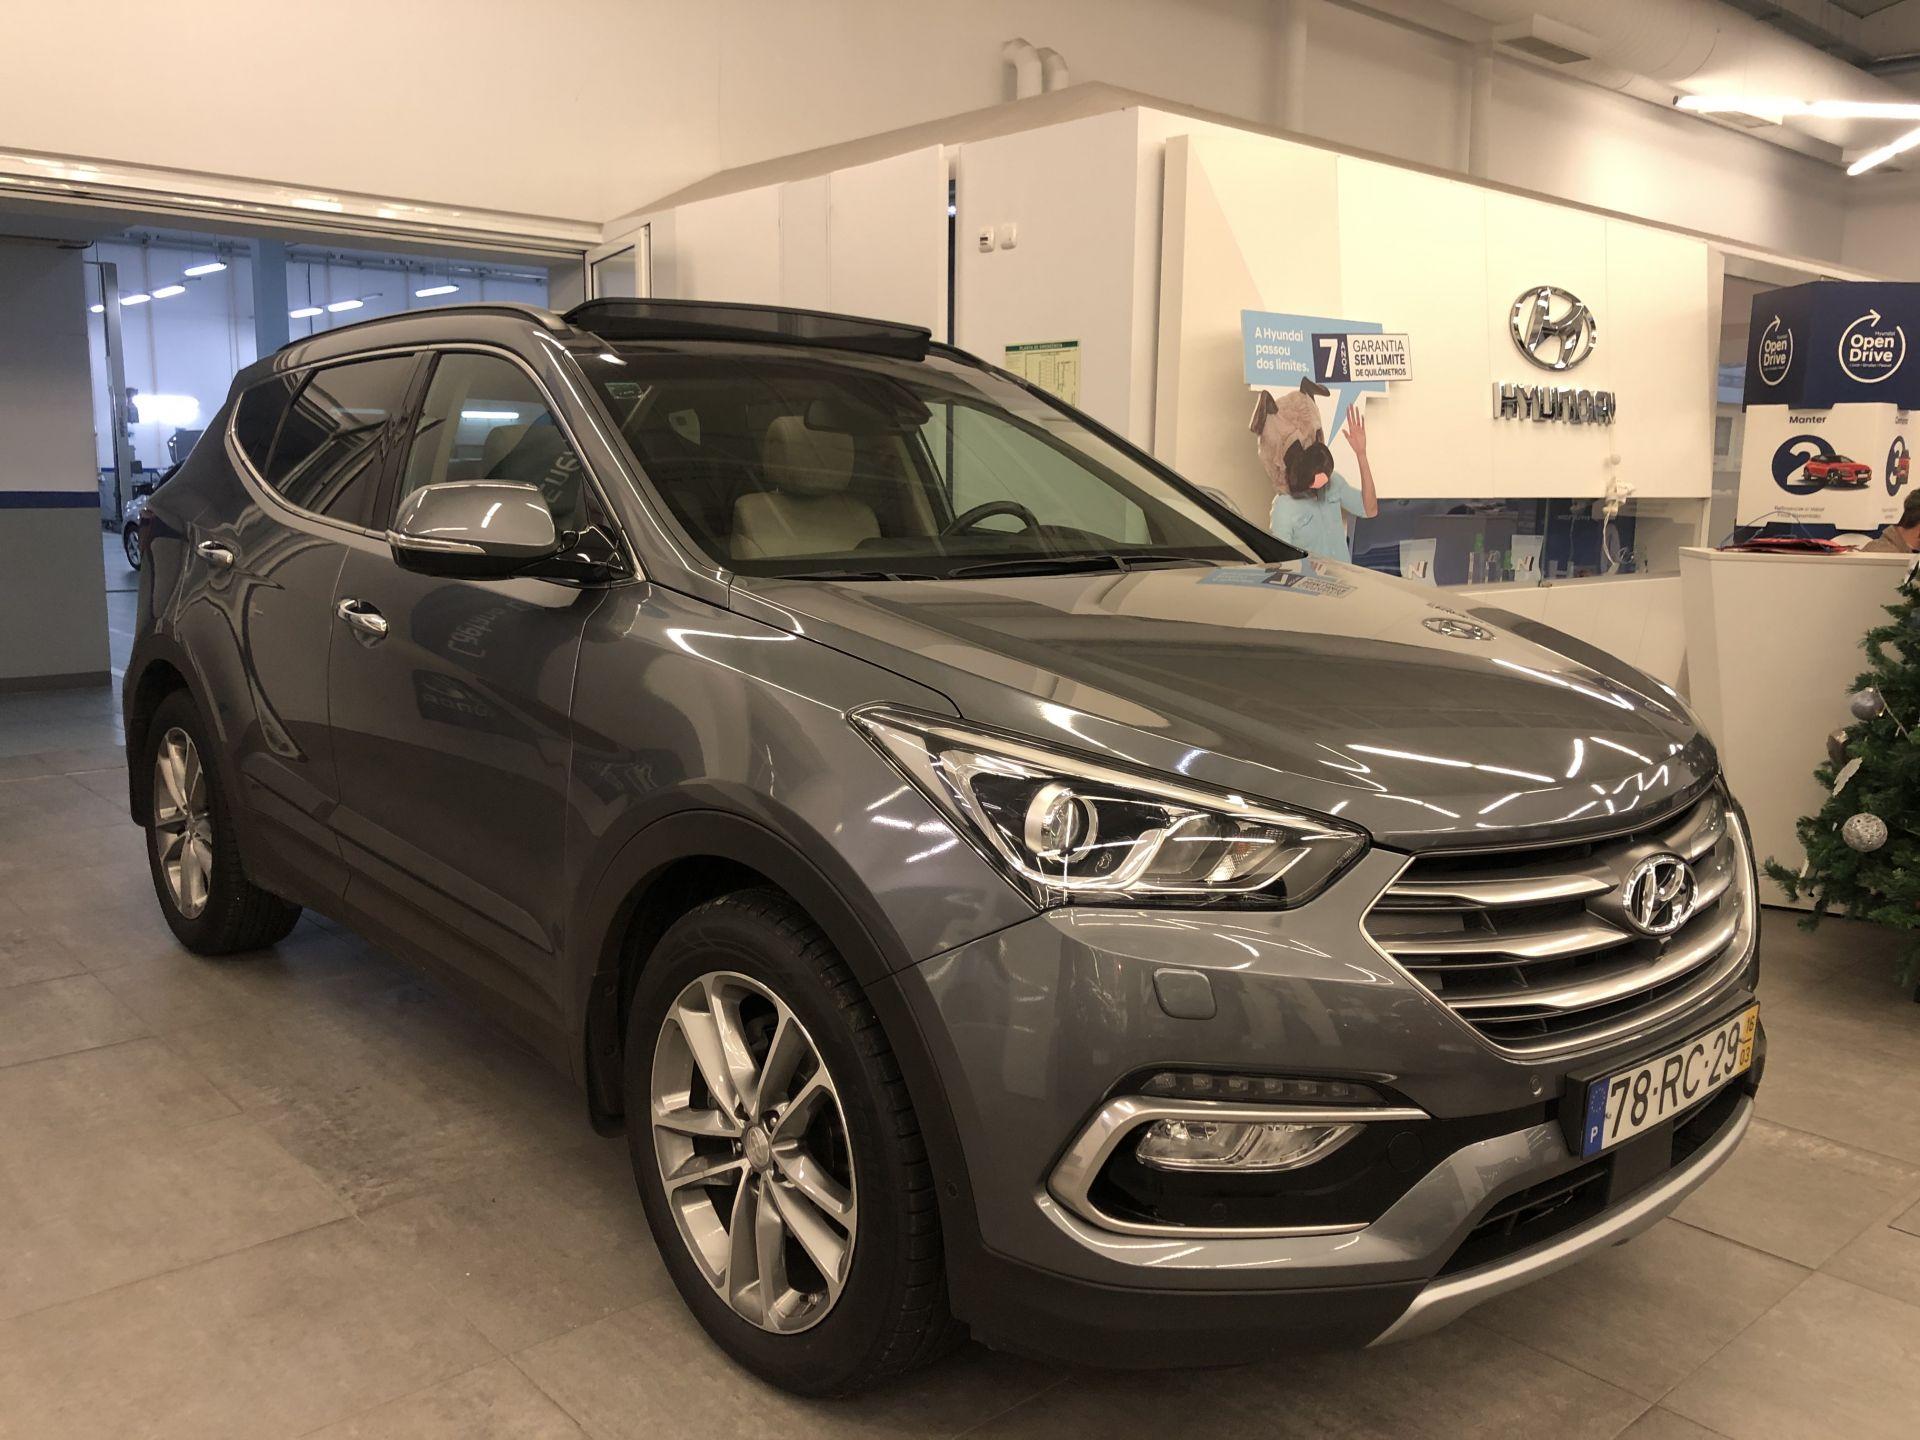 Hyundai Santa Fe 4X2-7 LUG 2.2 A/T PREMIUM MY16 segunda mão Porto